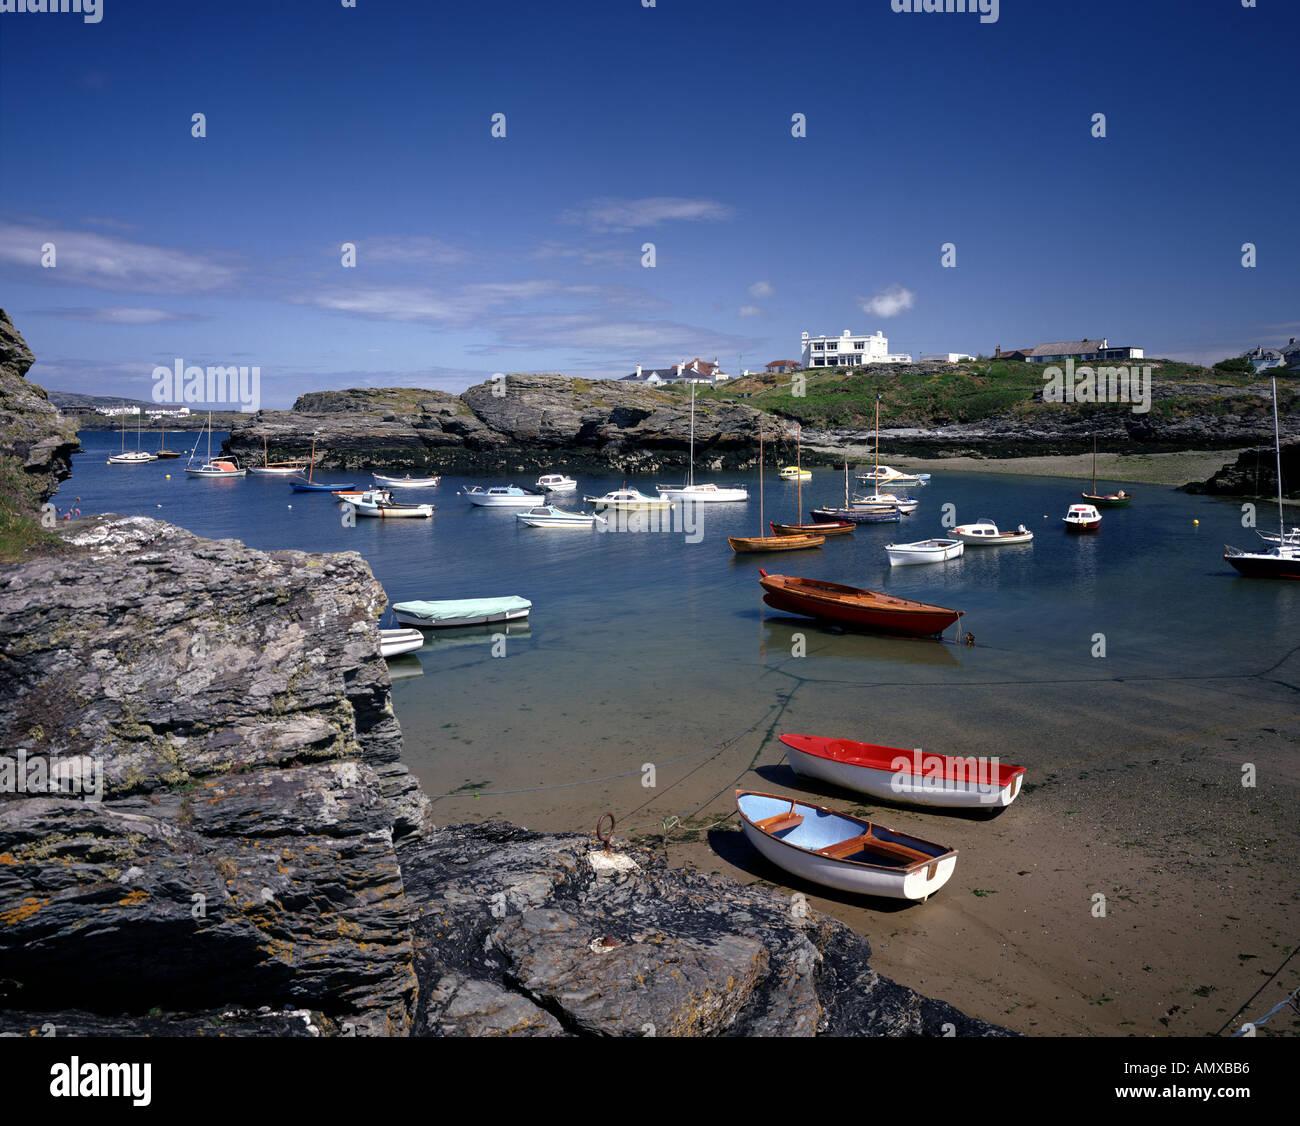 GB - WALES: Trearddur Bay on Anglesey - Stock Image